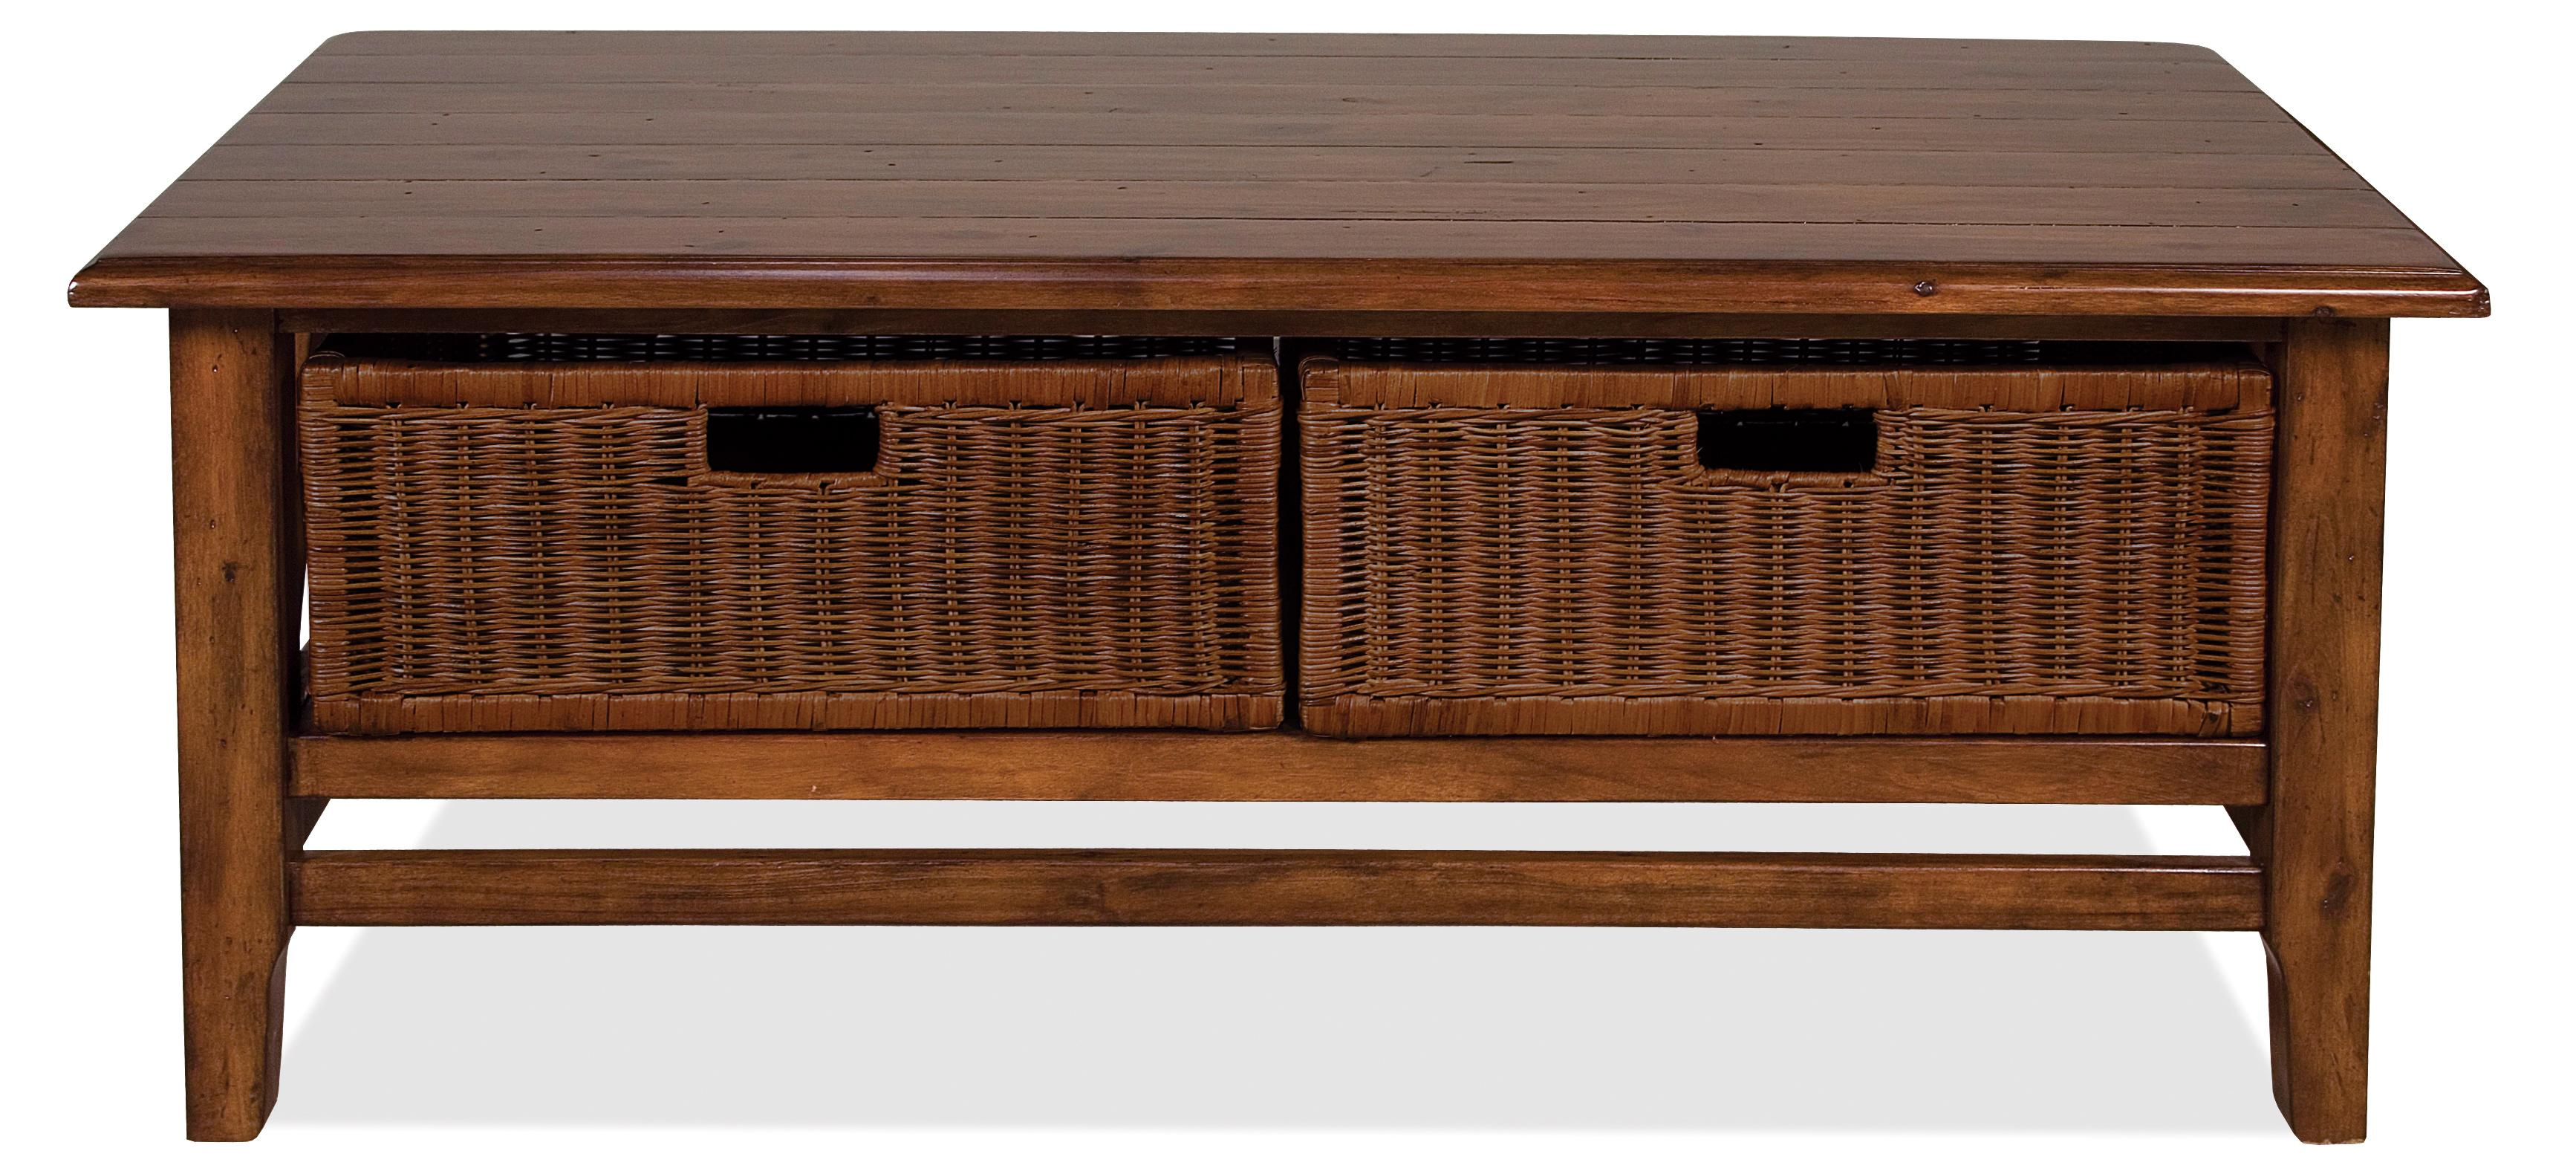 Riverside Furniture Claremont  Rectangular Cocktail Table - Item Number: 79502